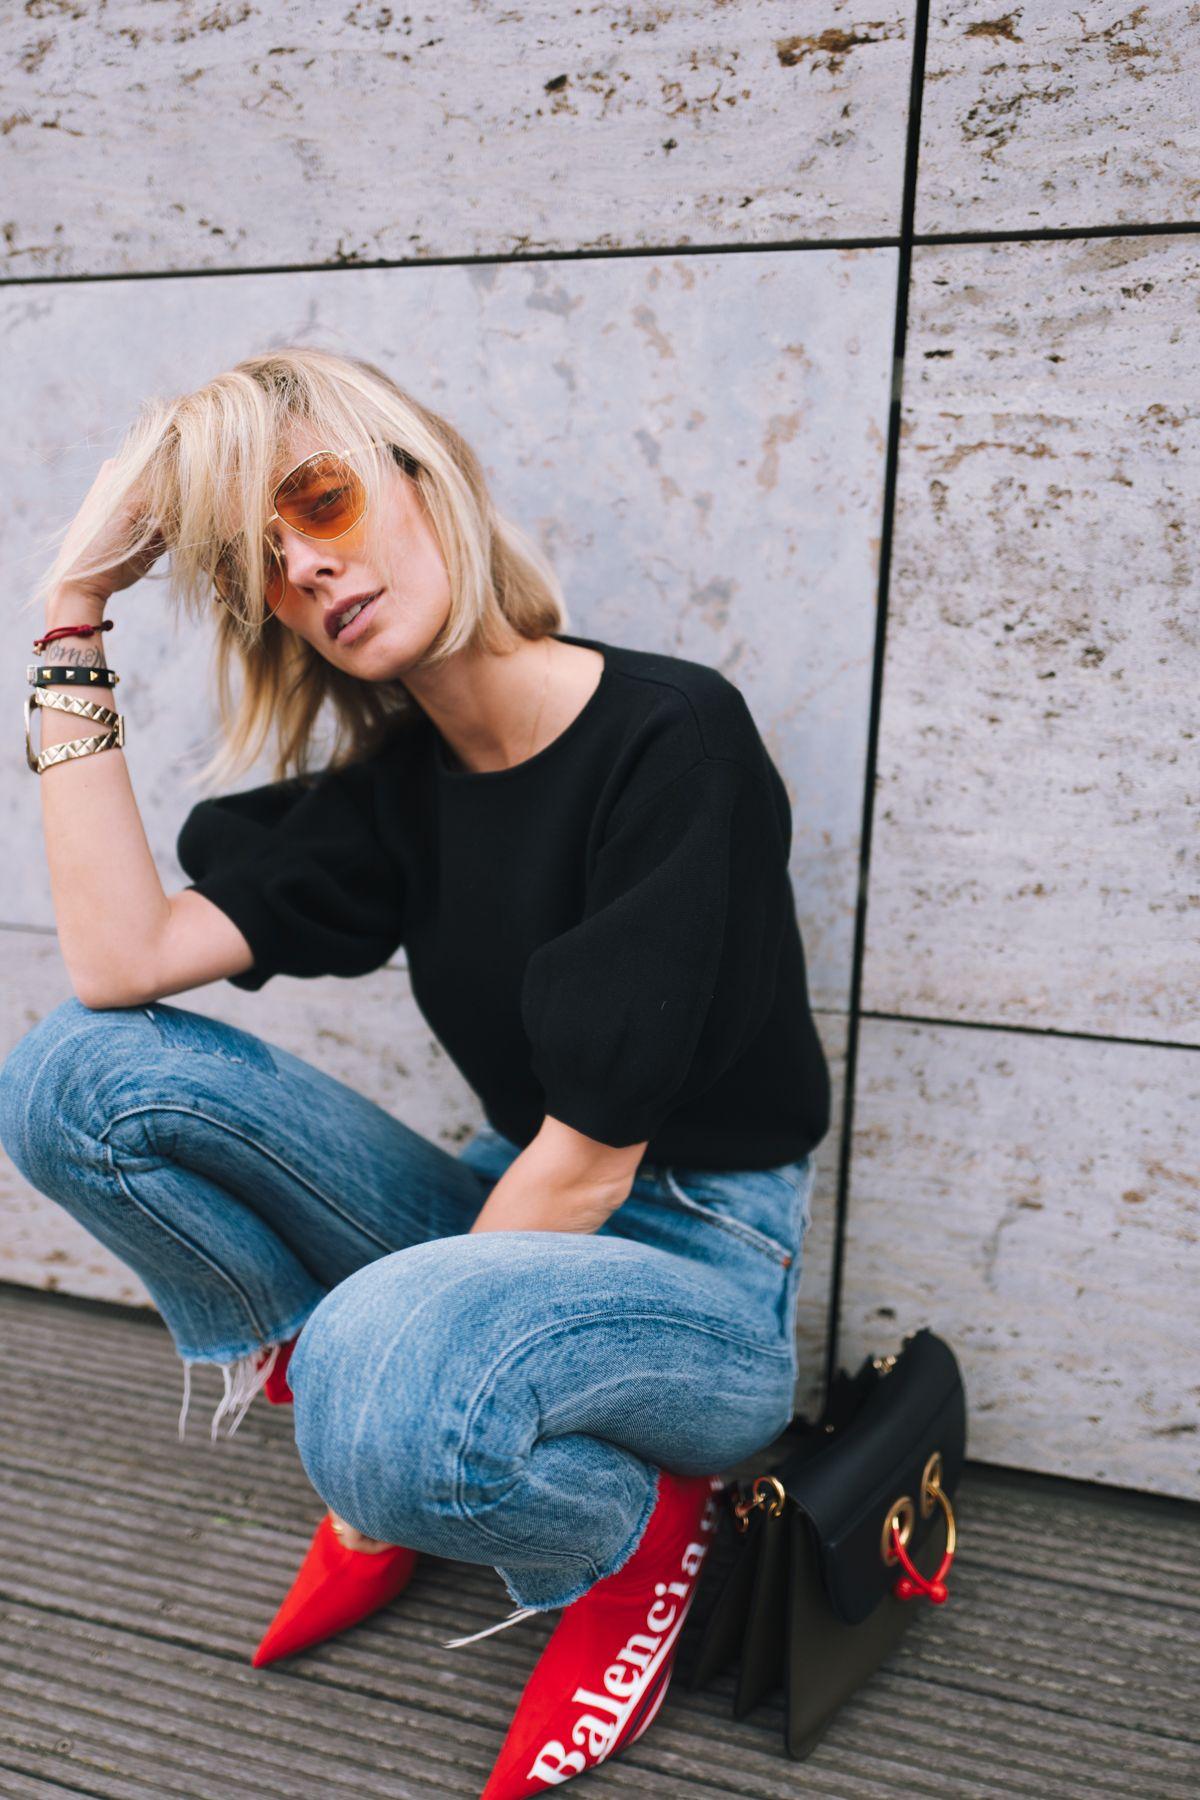 e9632df602d035 Balenciaga x Colette Knife Boots Outfit - Lisa Hahnbück Fashion Blog ...